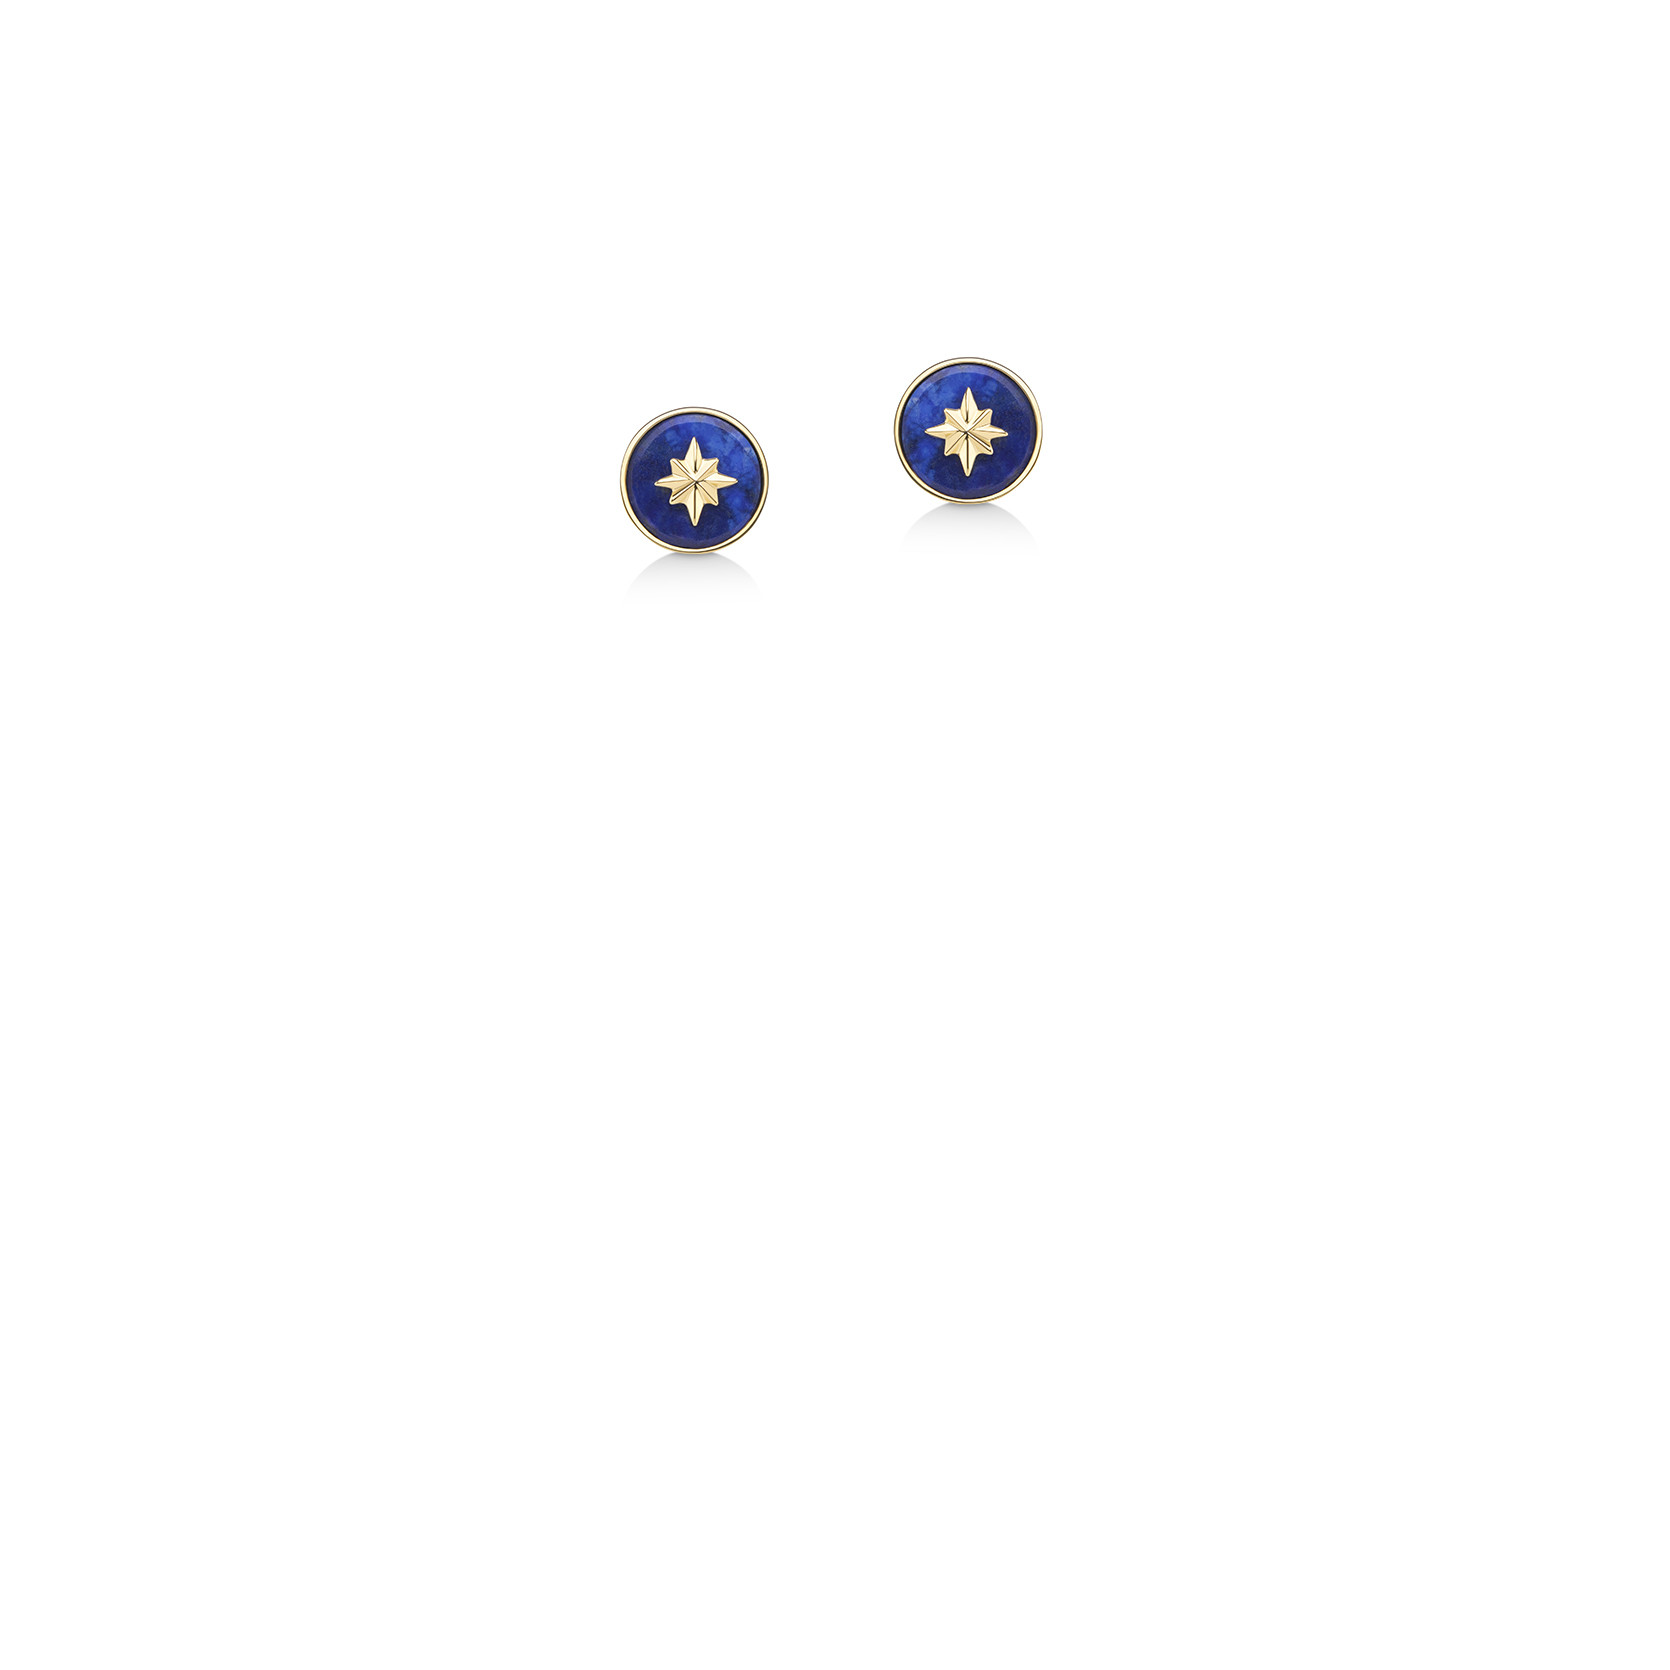 Brinco Star Lapis Lazuli - UNI